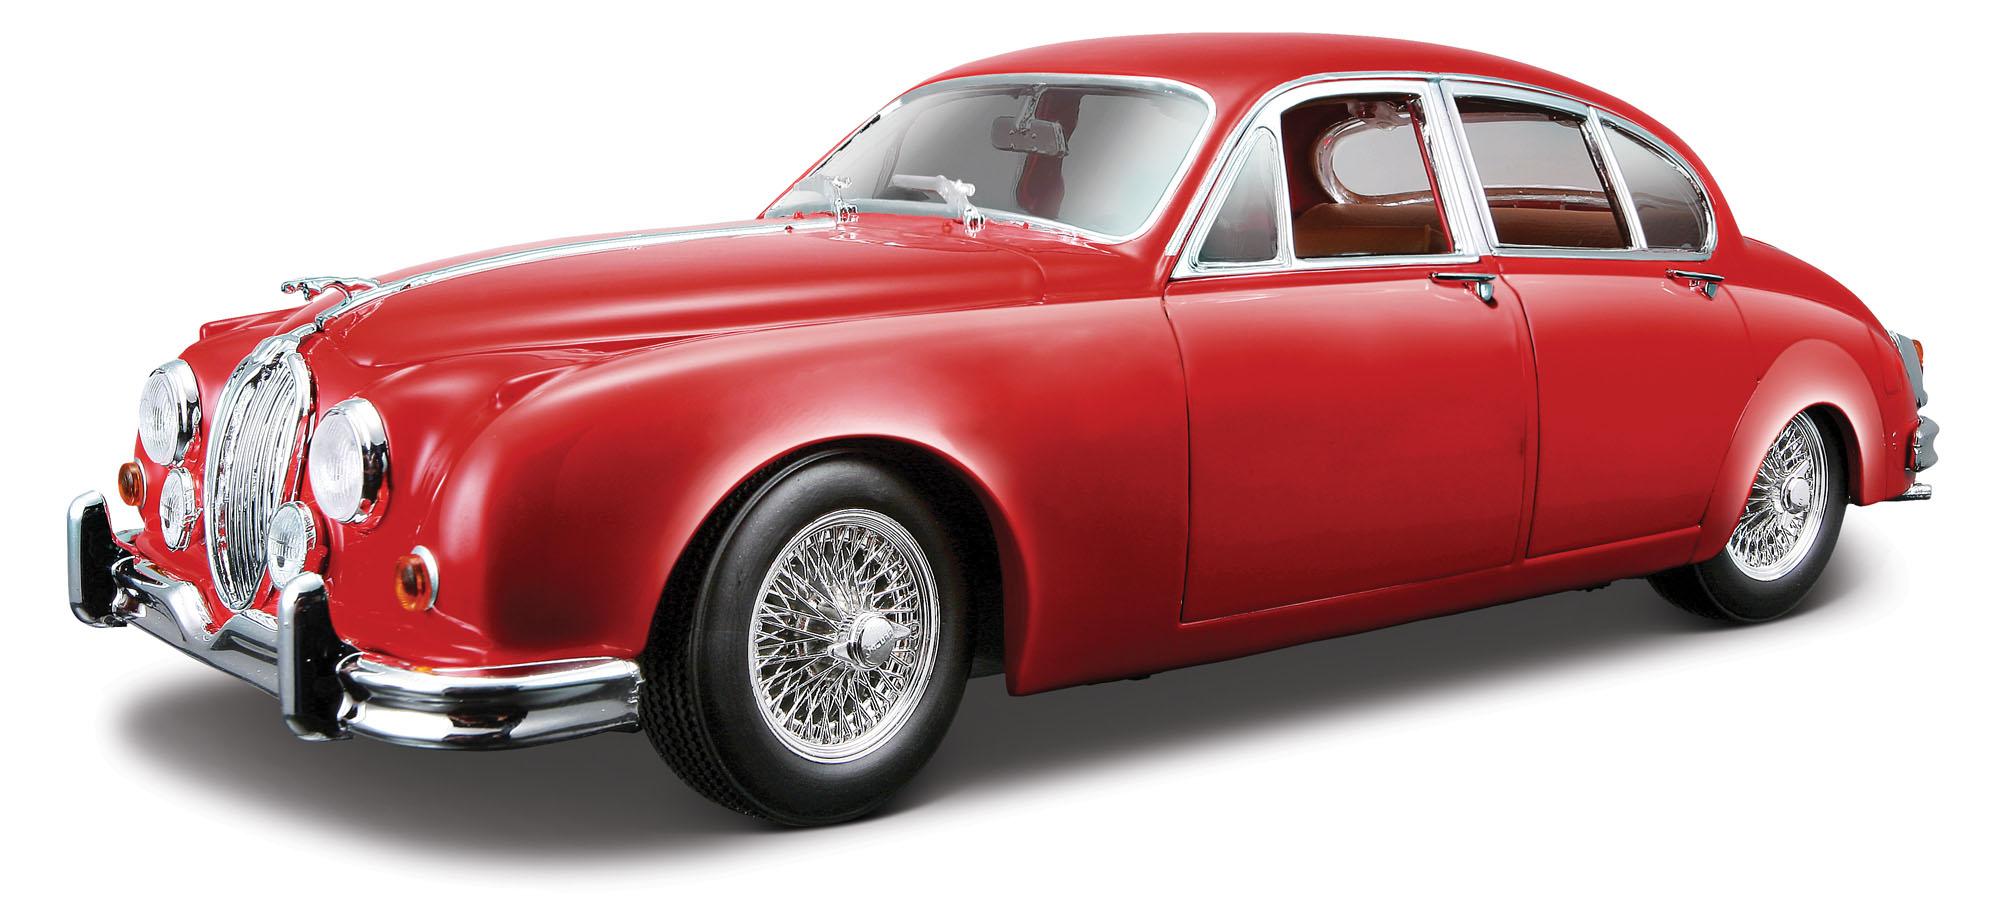 18-12009  Jaguar MkII 1959, rood, Bburago